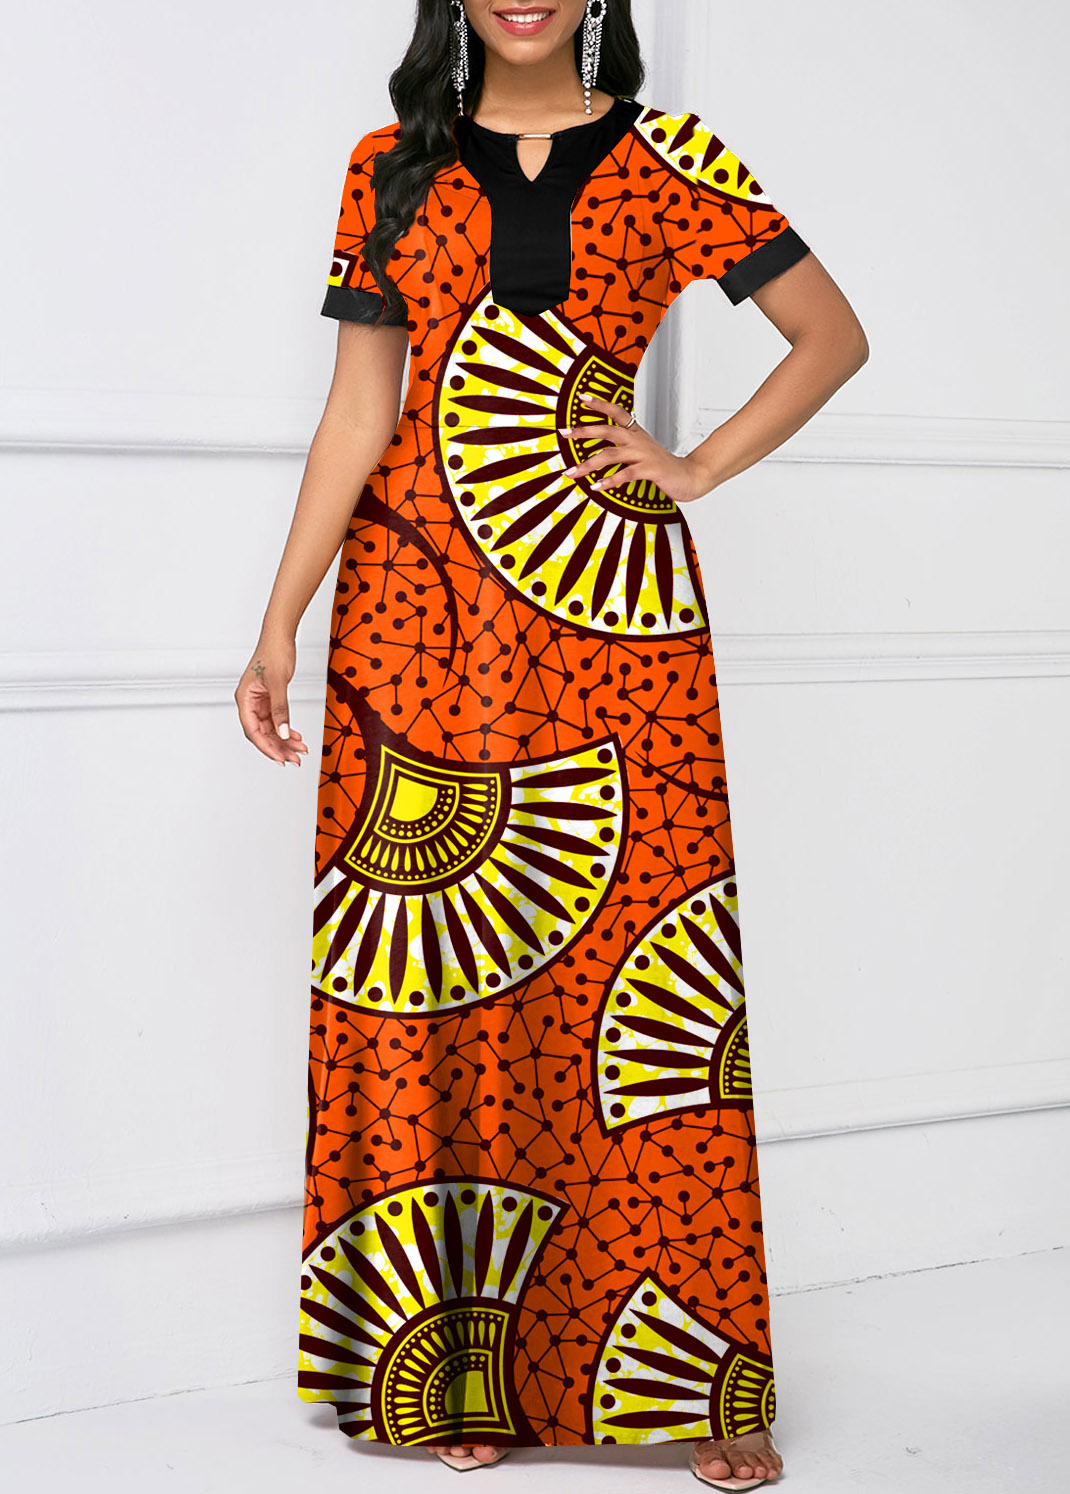 ROTITA Keyhole Neckline Tribal Print Short Sleeve Dress